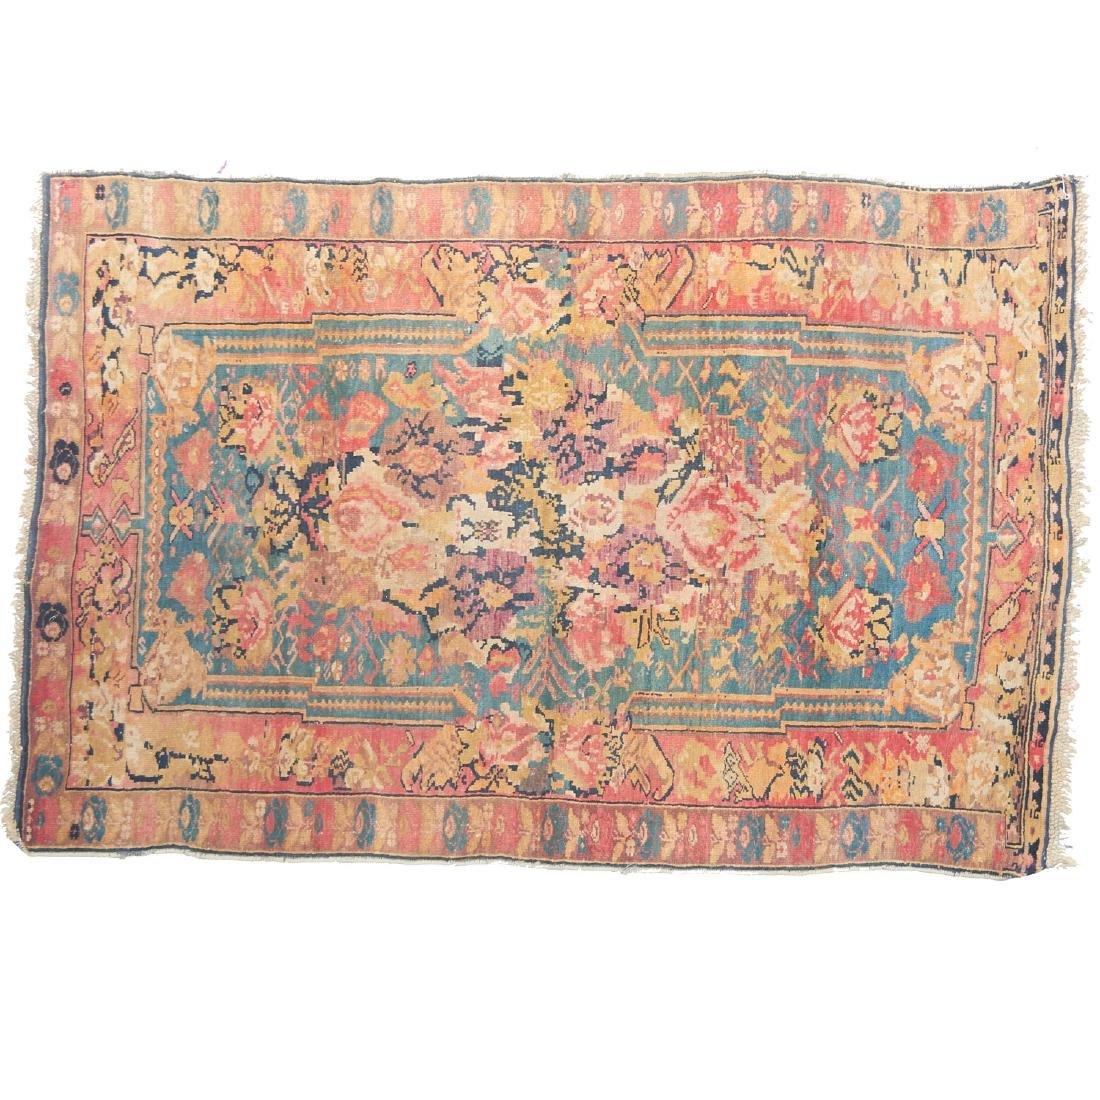 Persian Export rug, ex museum